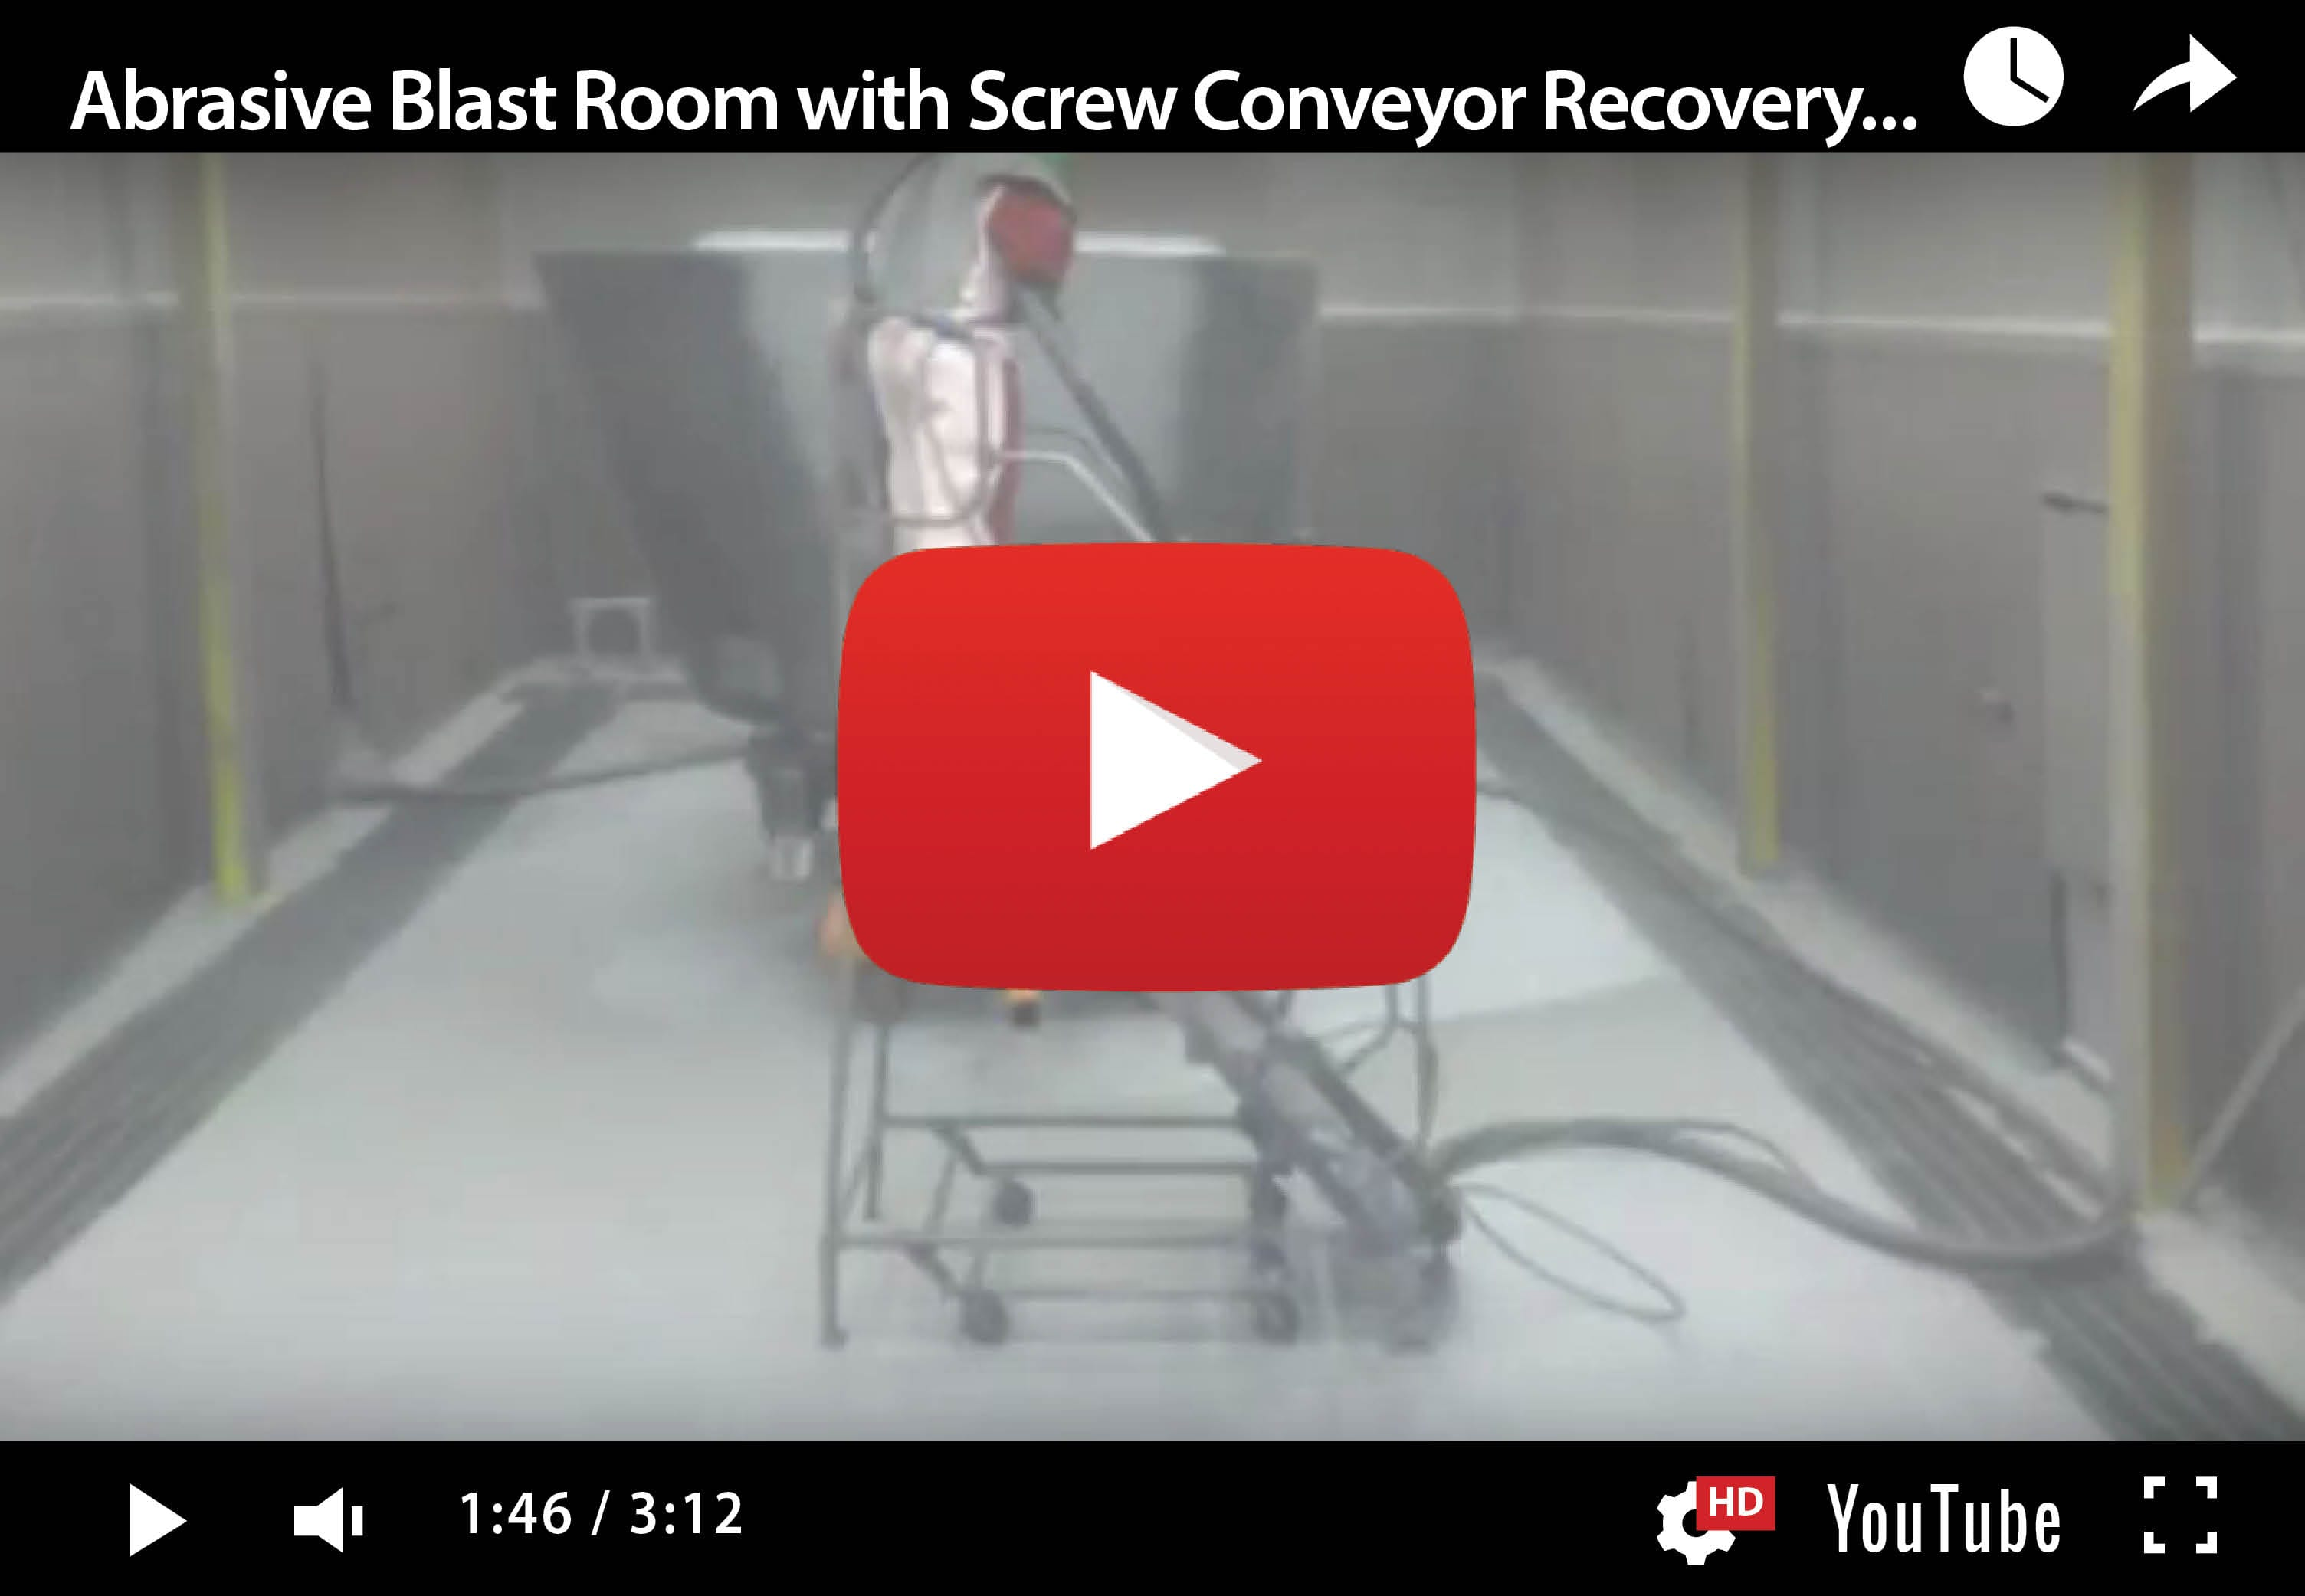 Mechanical Recovery System – Screw Conveyor & Bucket Elevator